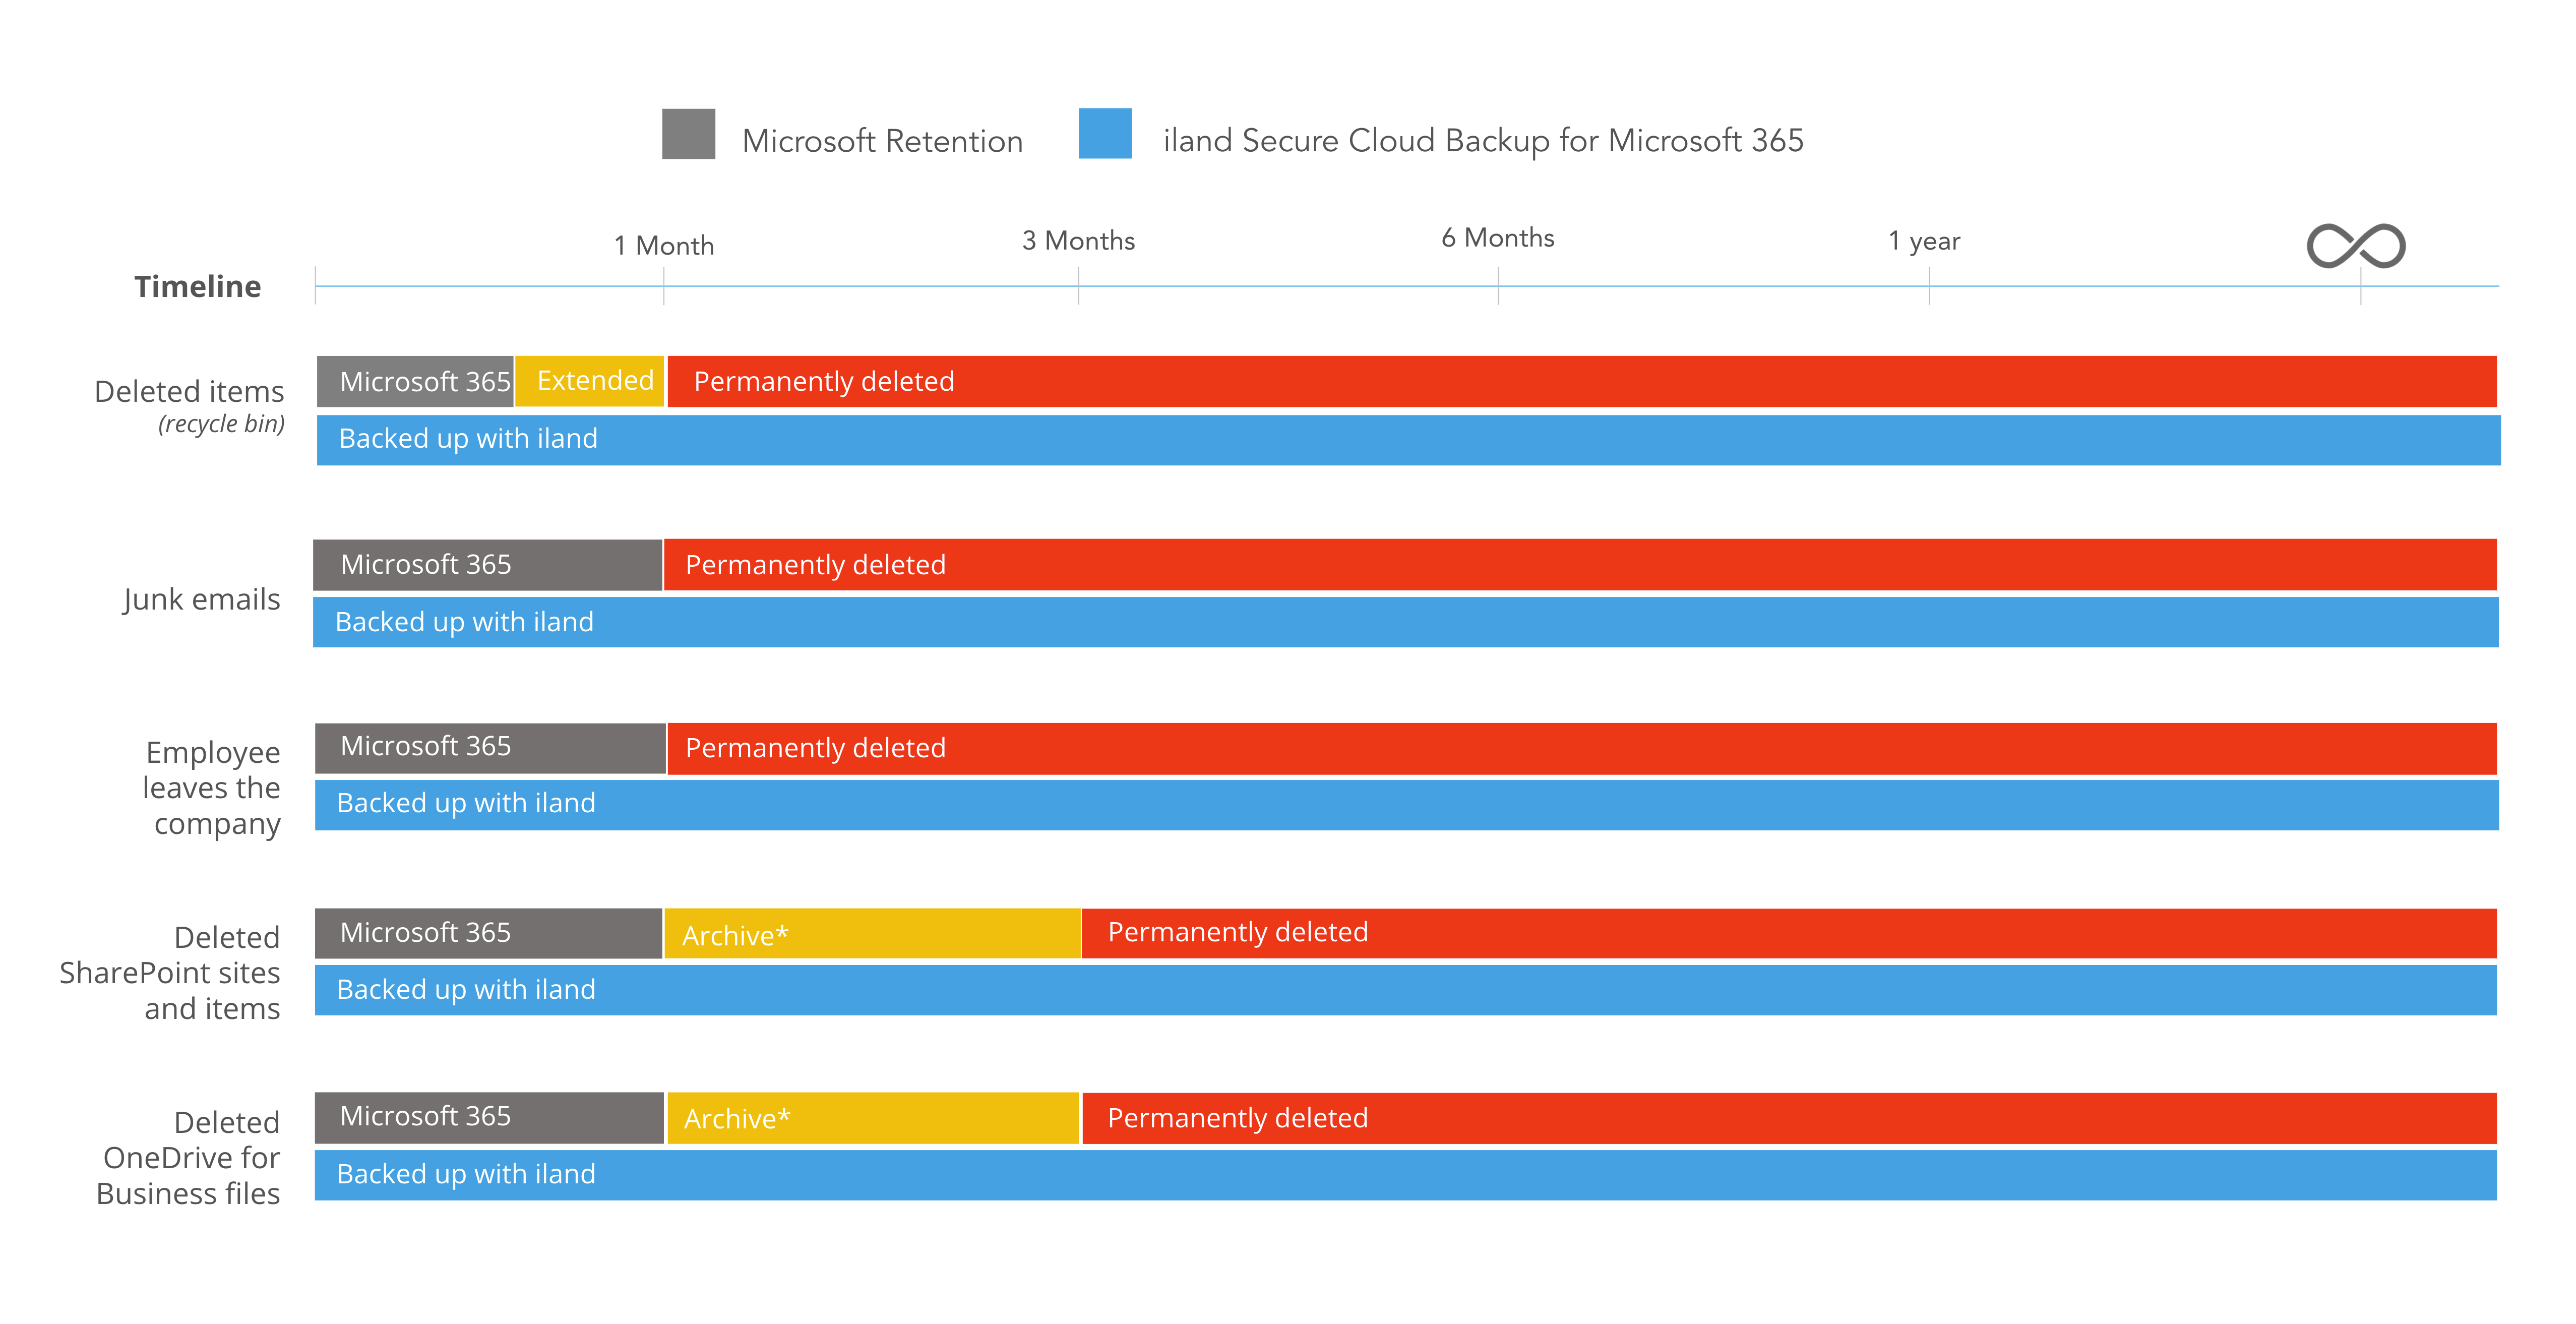 Microsoft 365 Backup compared to iland Secure Cloud Backup for Microsoft 365